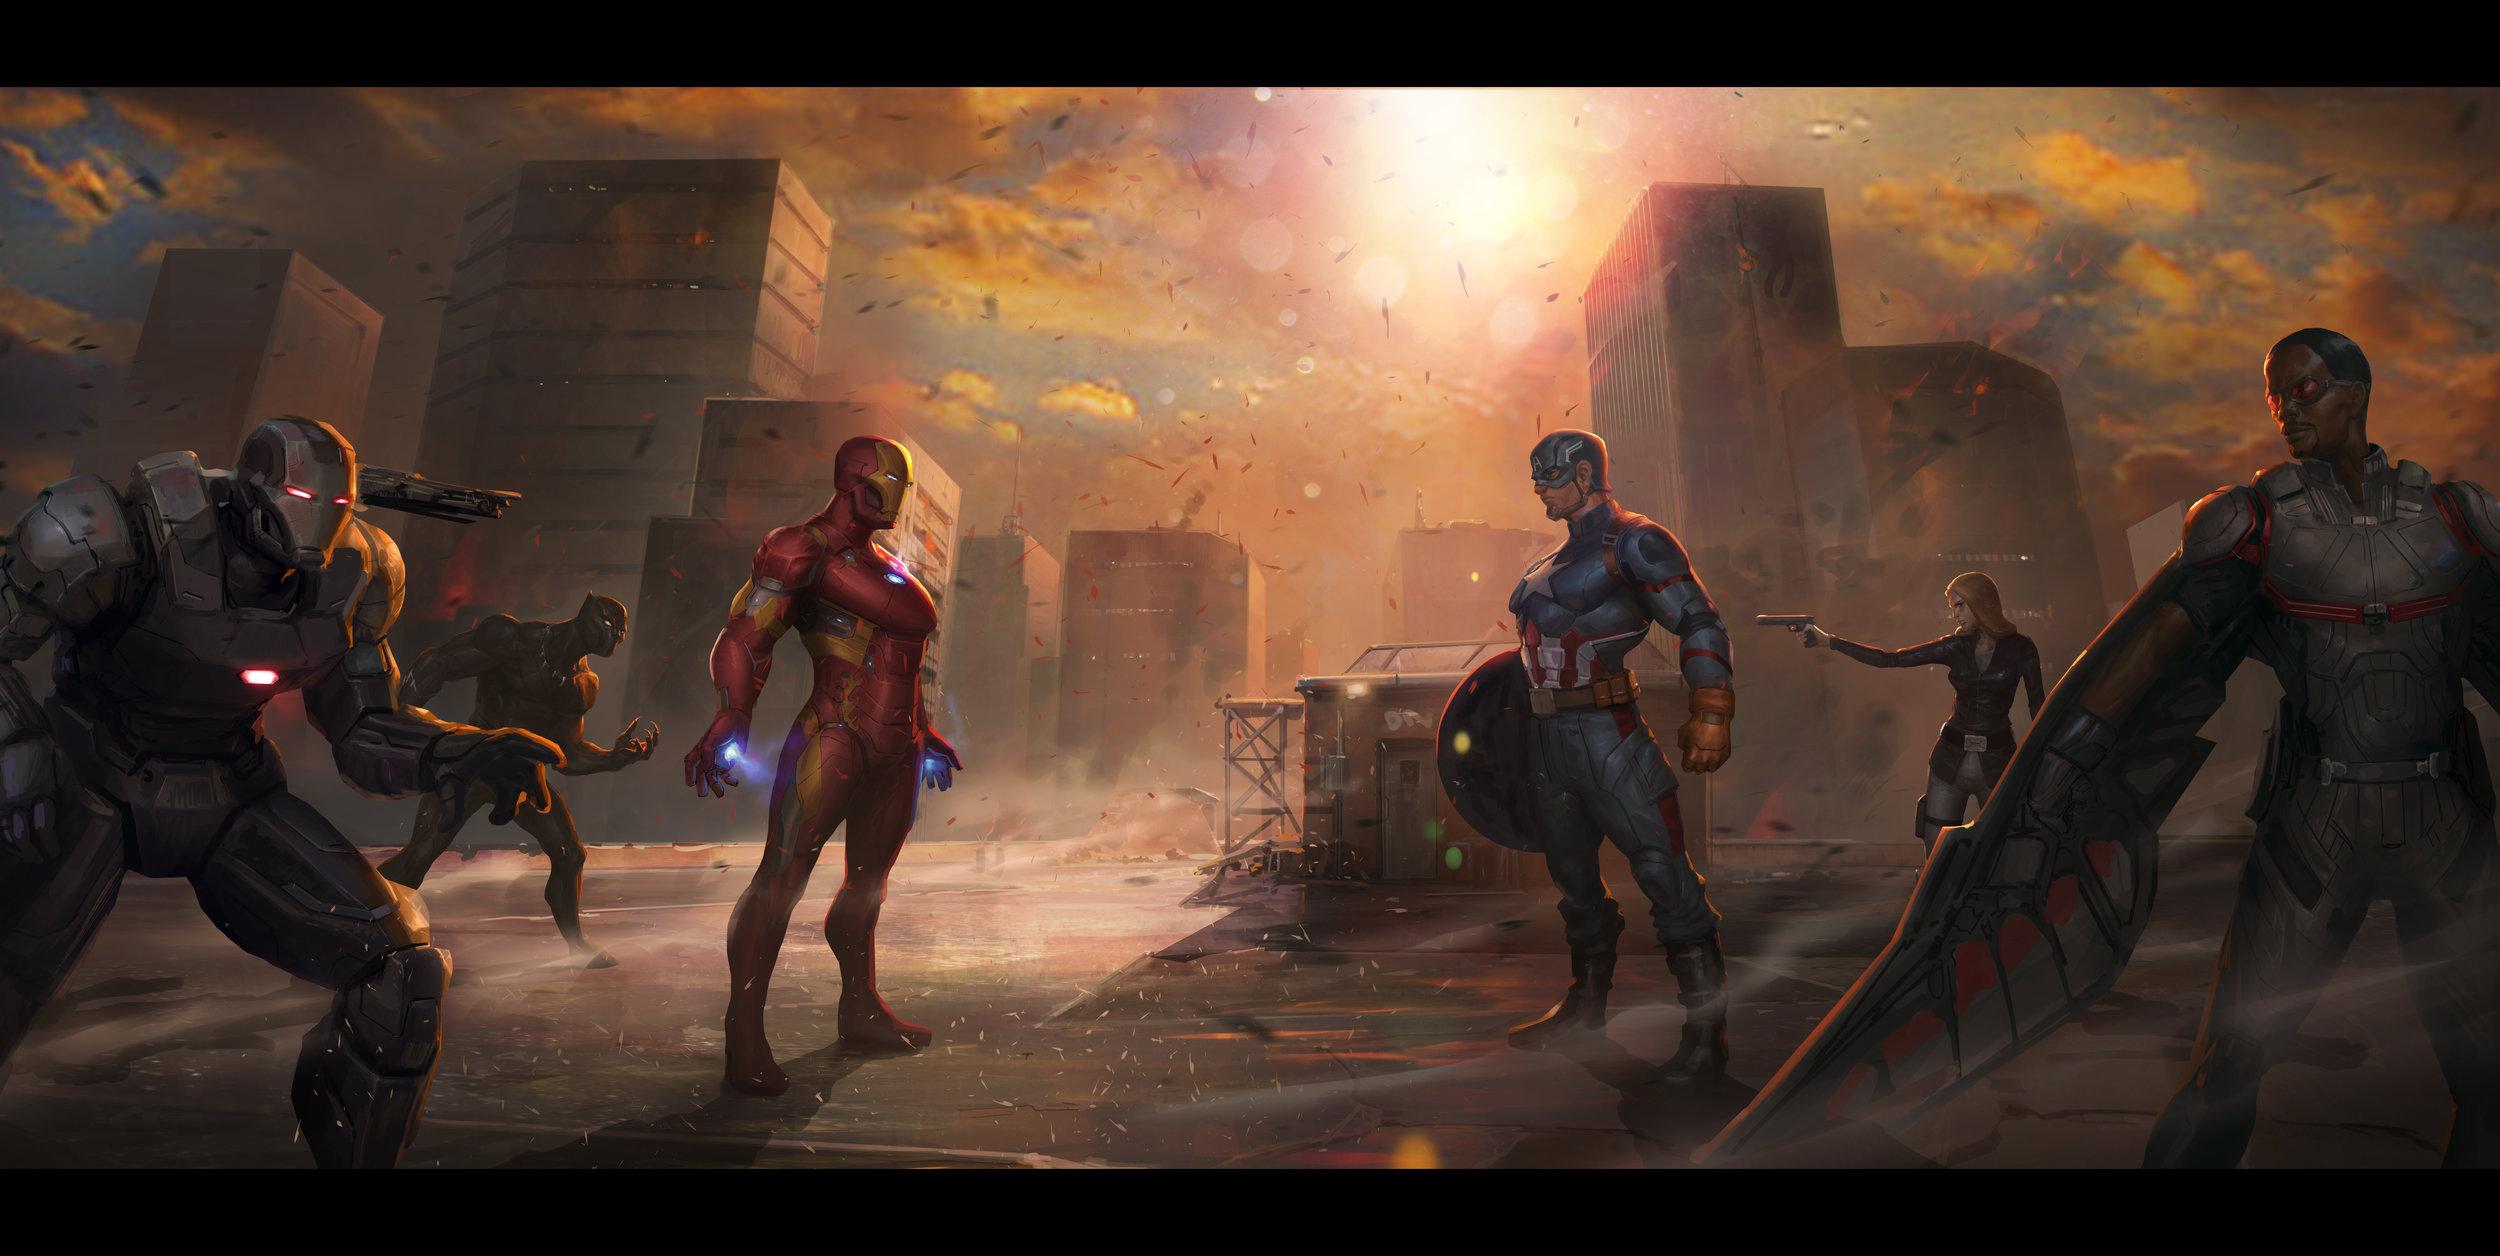 Marvel_AA2_0080_v005.jpg